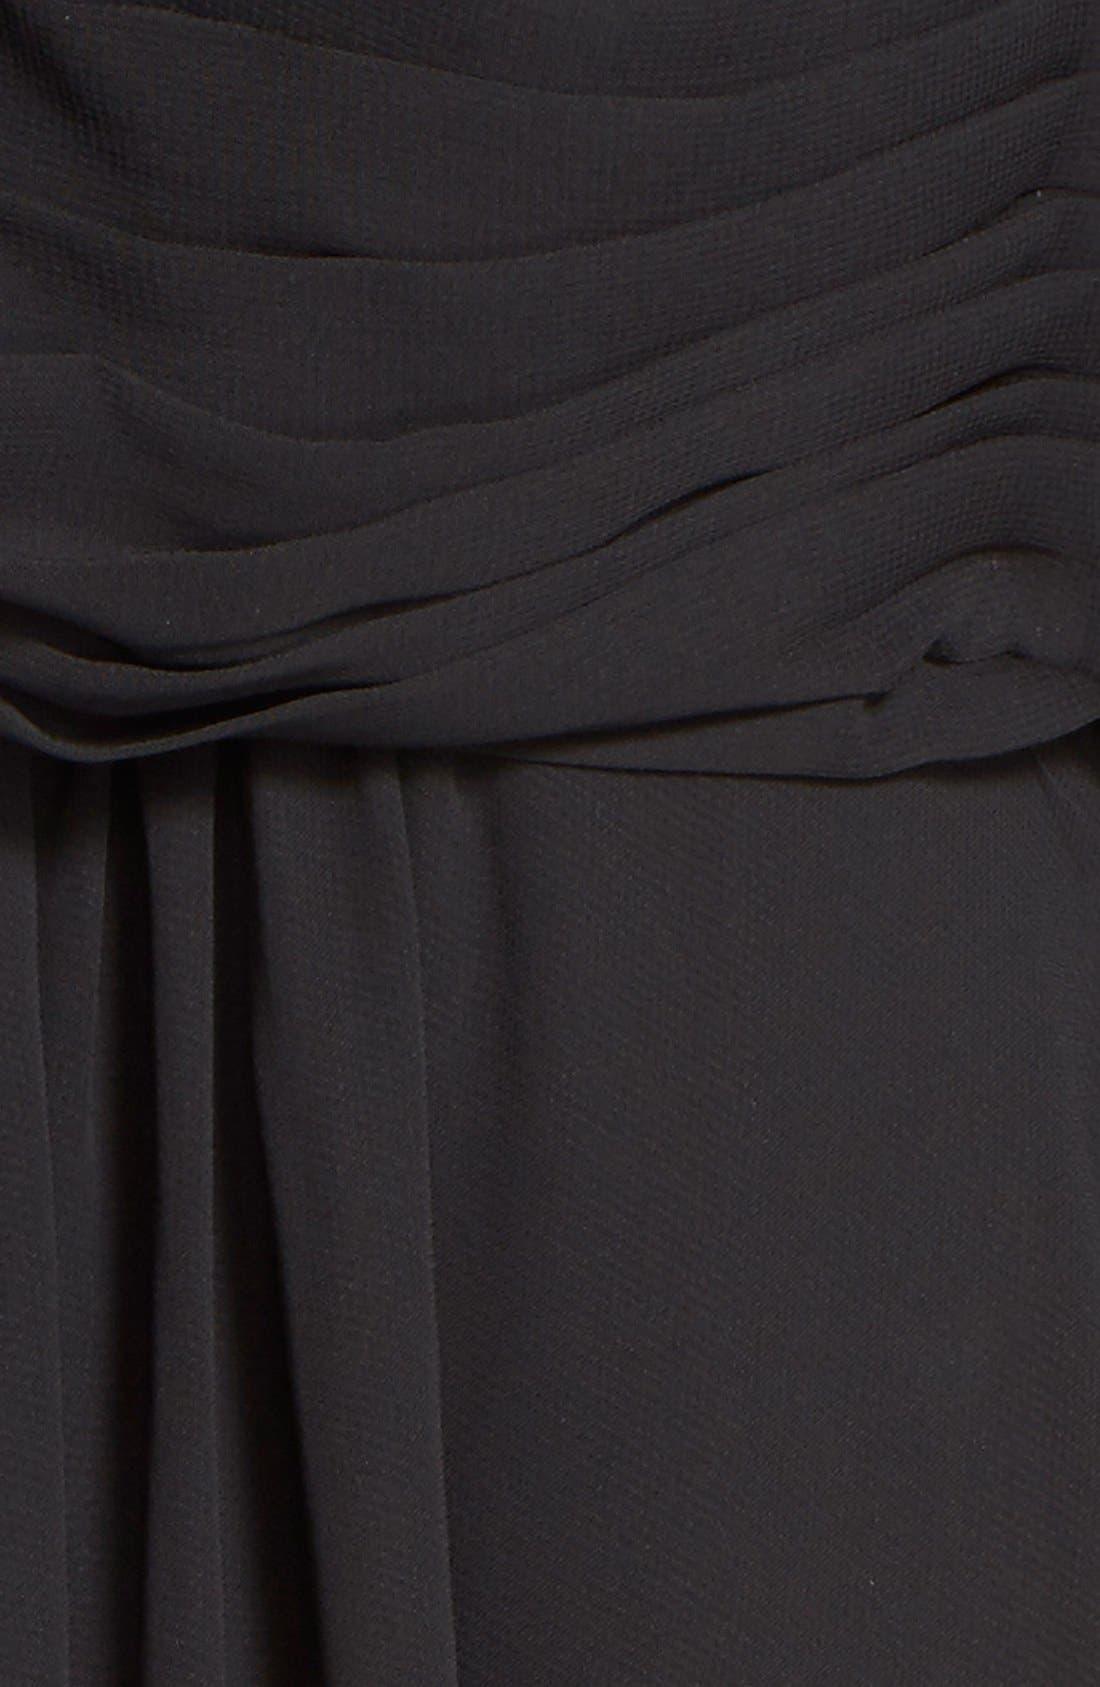 Embellished Keyhole Neck Chiffon Gown,                             Alternate thumbnail 5, color,                             Black